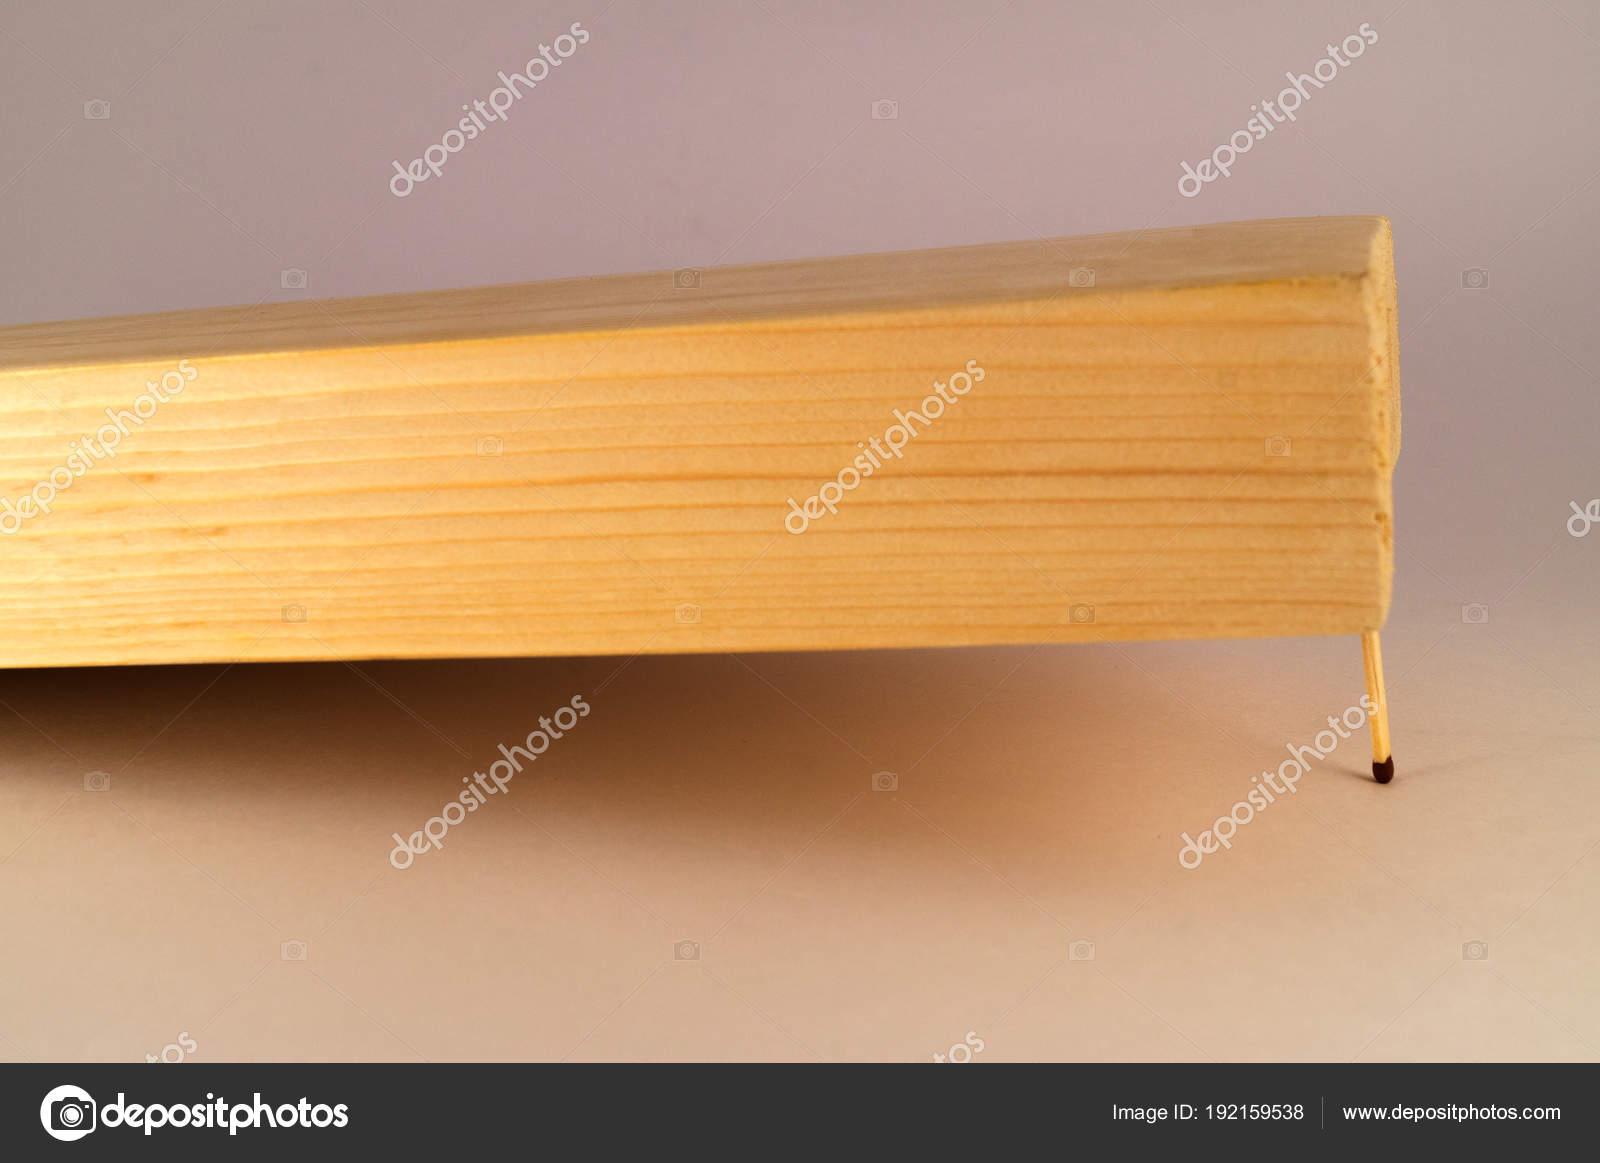 Blinde Houten Wandplank.Blinde Wandplank Steigerhout Affordable Wandplanken Woonkamer Door